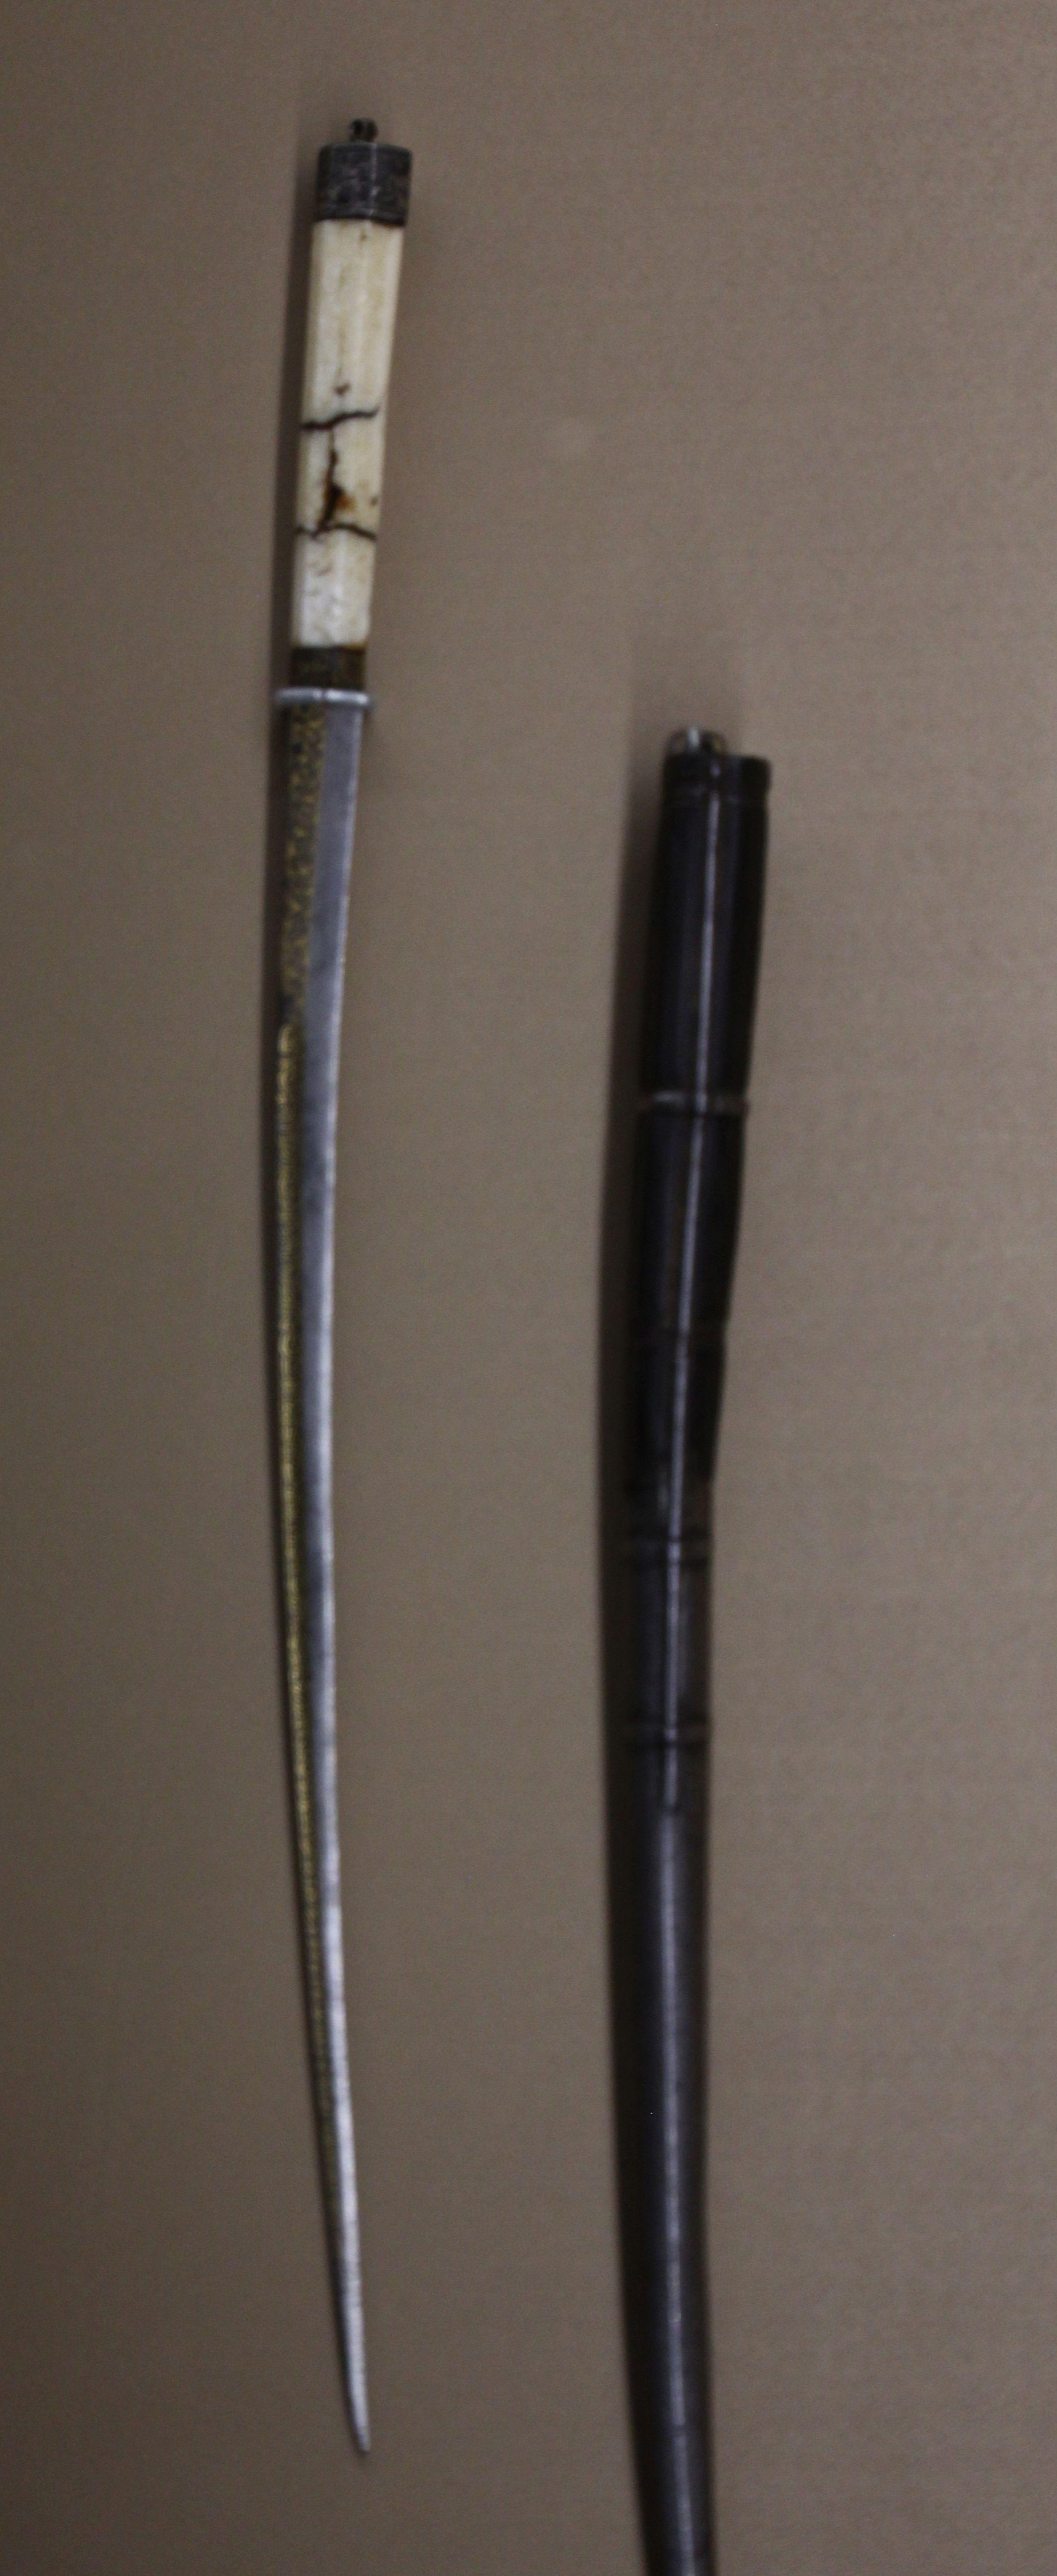 IMG-5551